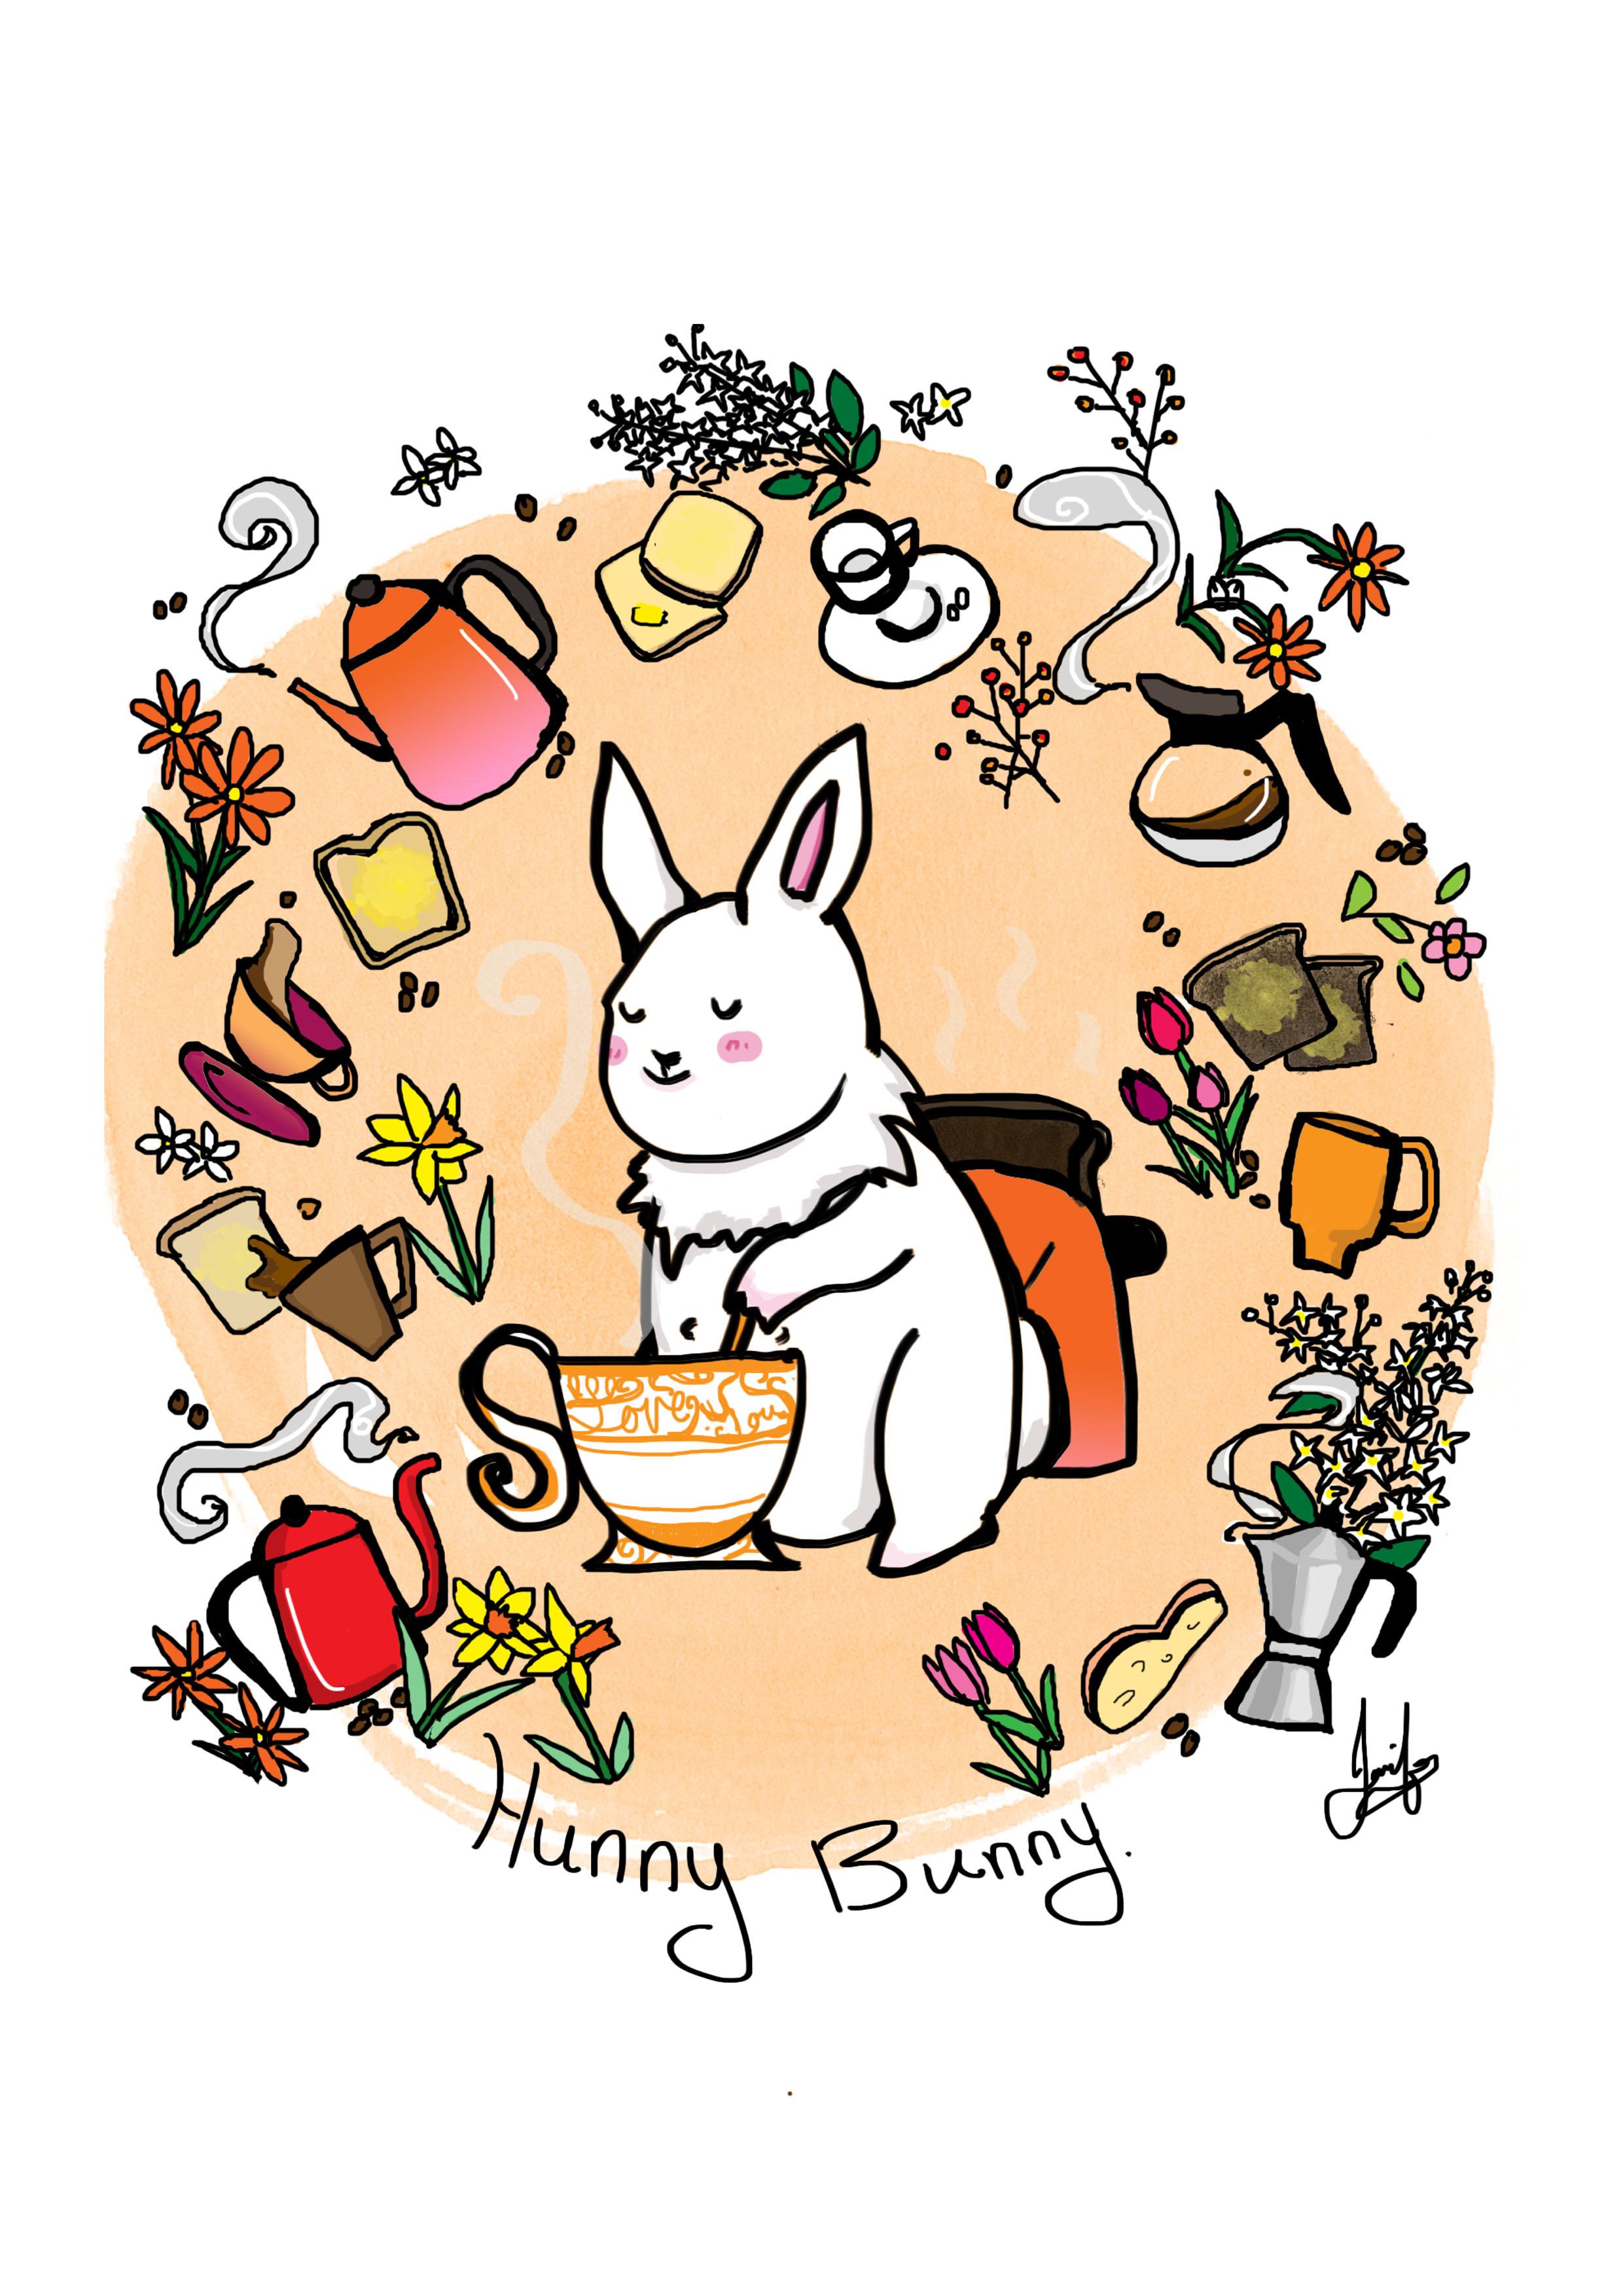 Helen's Hunny Bunny.jpg